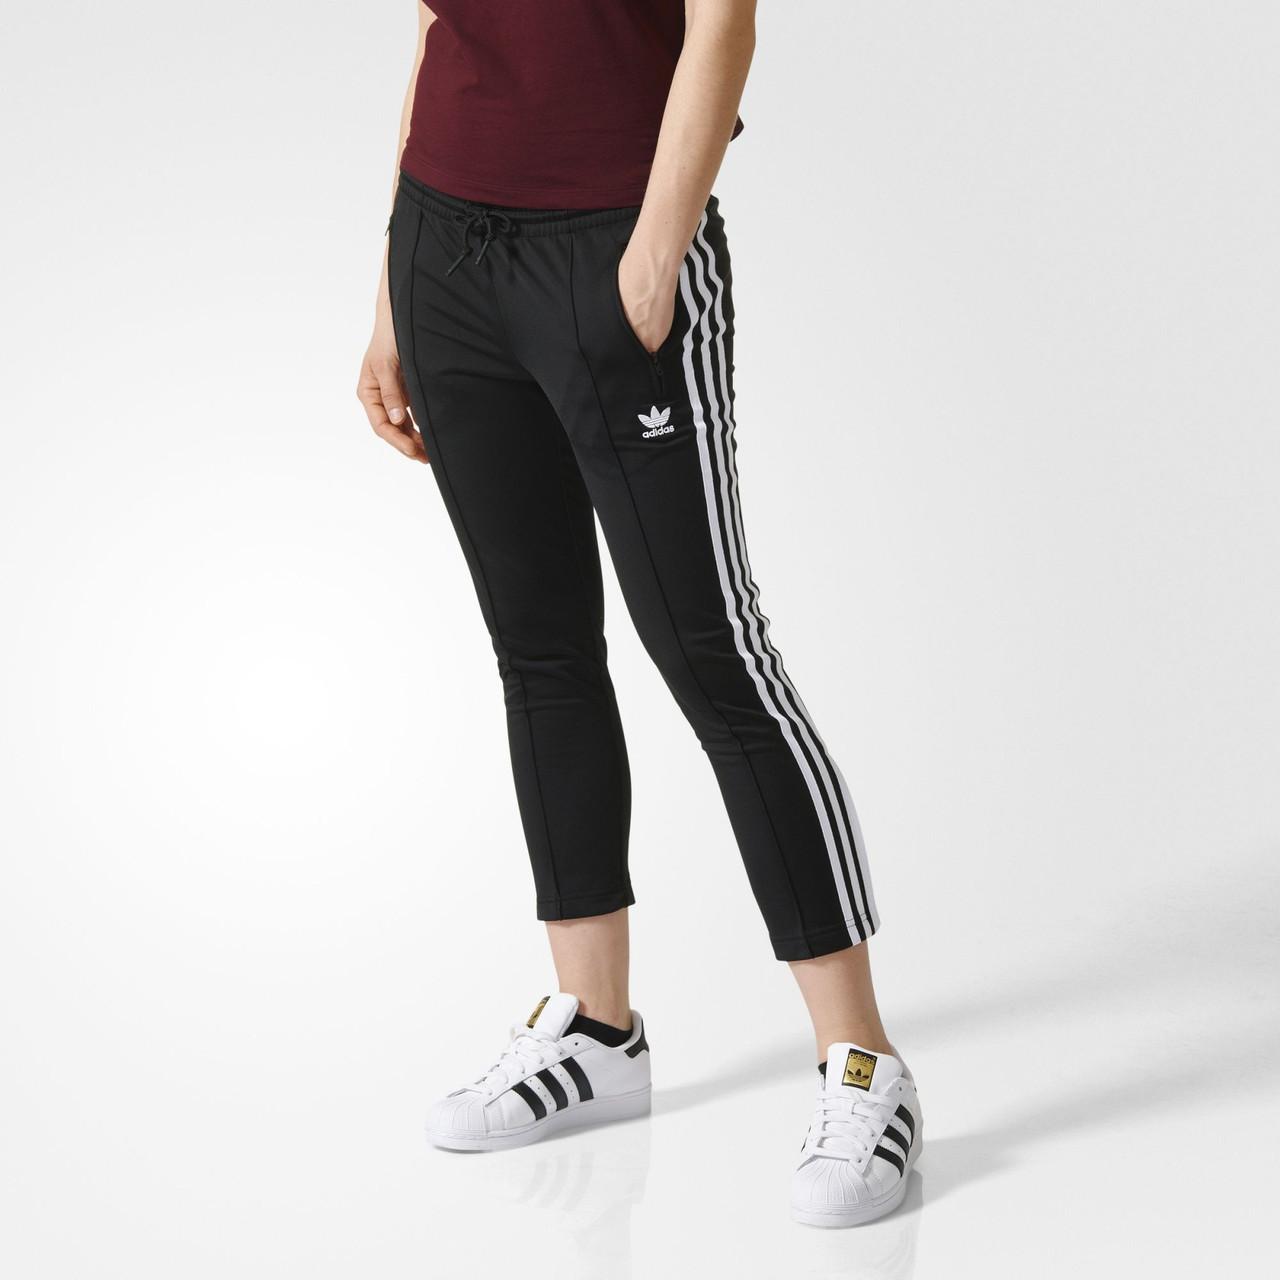 Женские брюки Adidas Originals Cigarette (Артикул  AY5239) -  Интернет-магазин «Эксперт 9468379da45